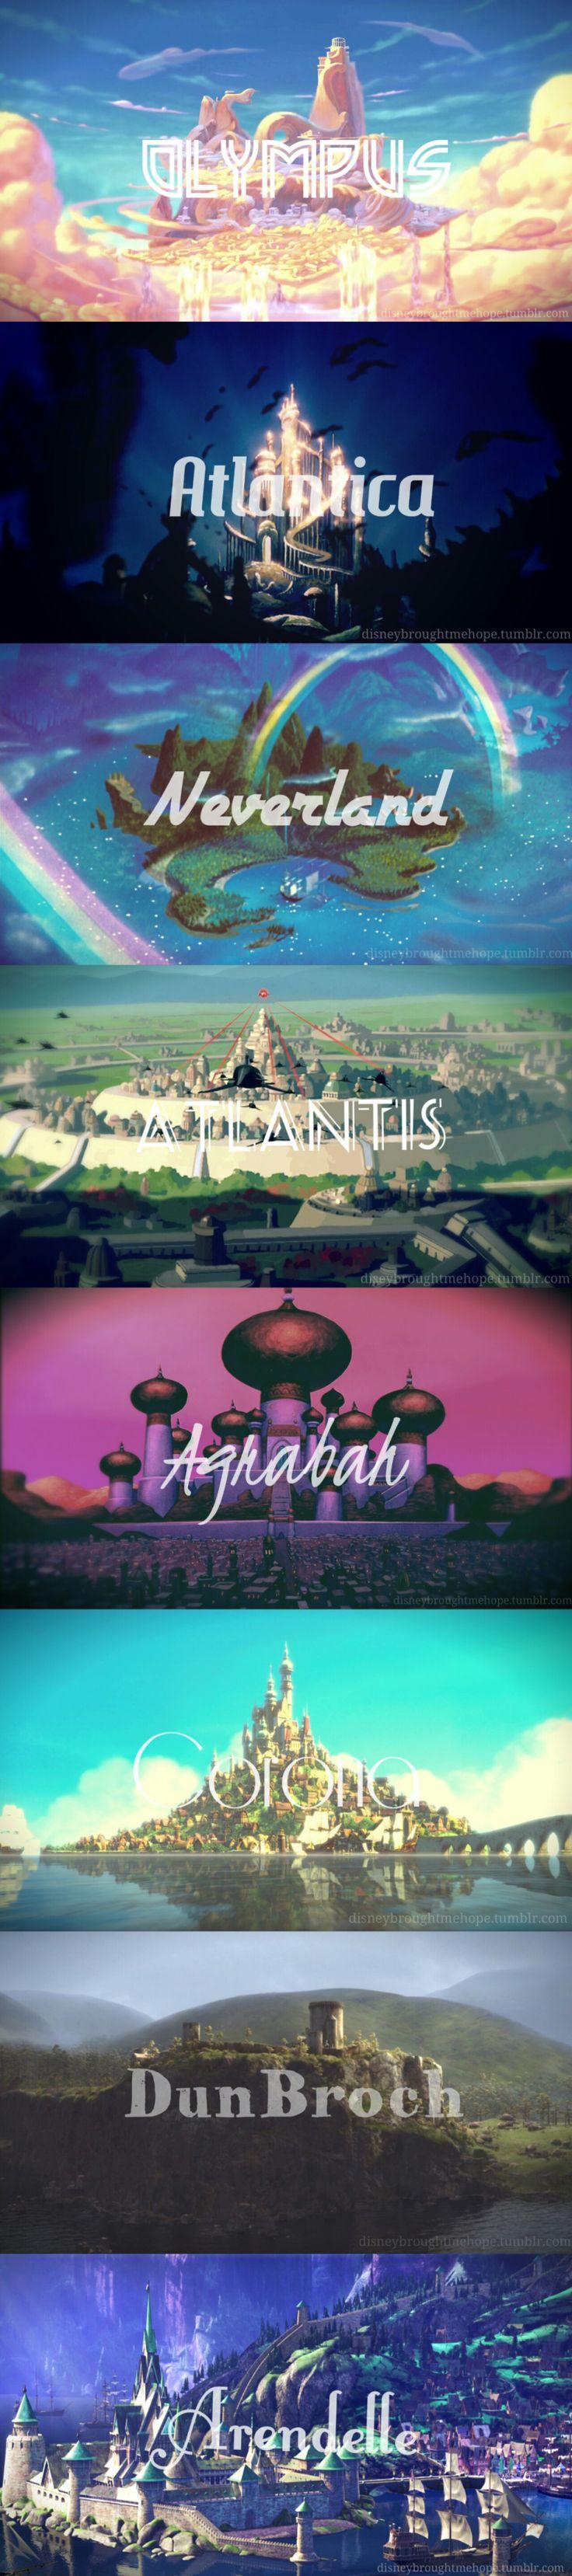 Kingdoms of Disney